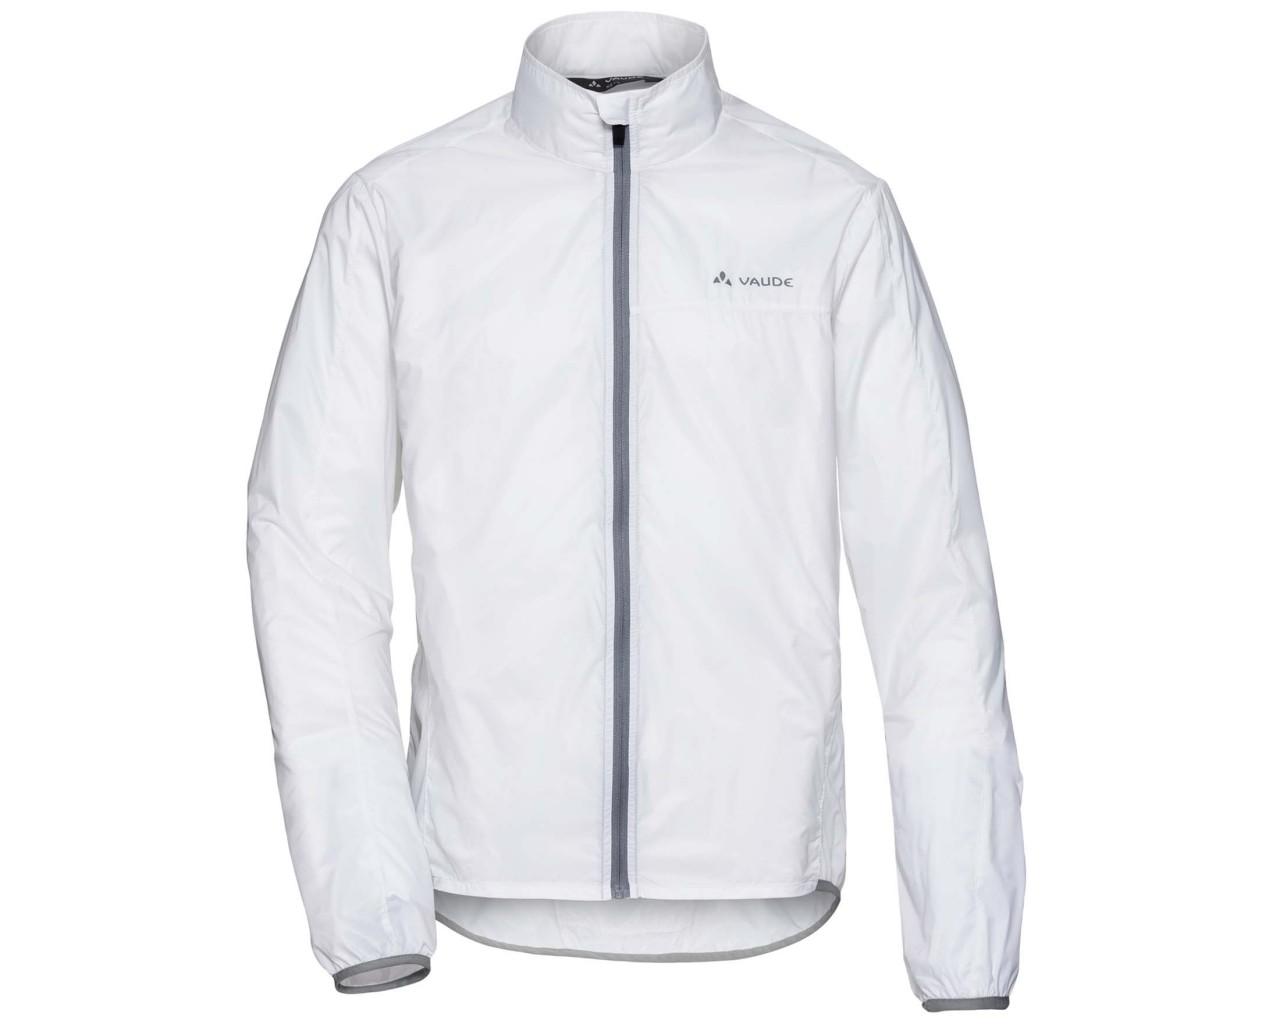 Vaude Herren Air Jacket III Leichte Windjacke | white